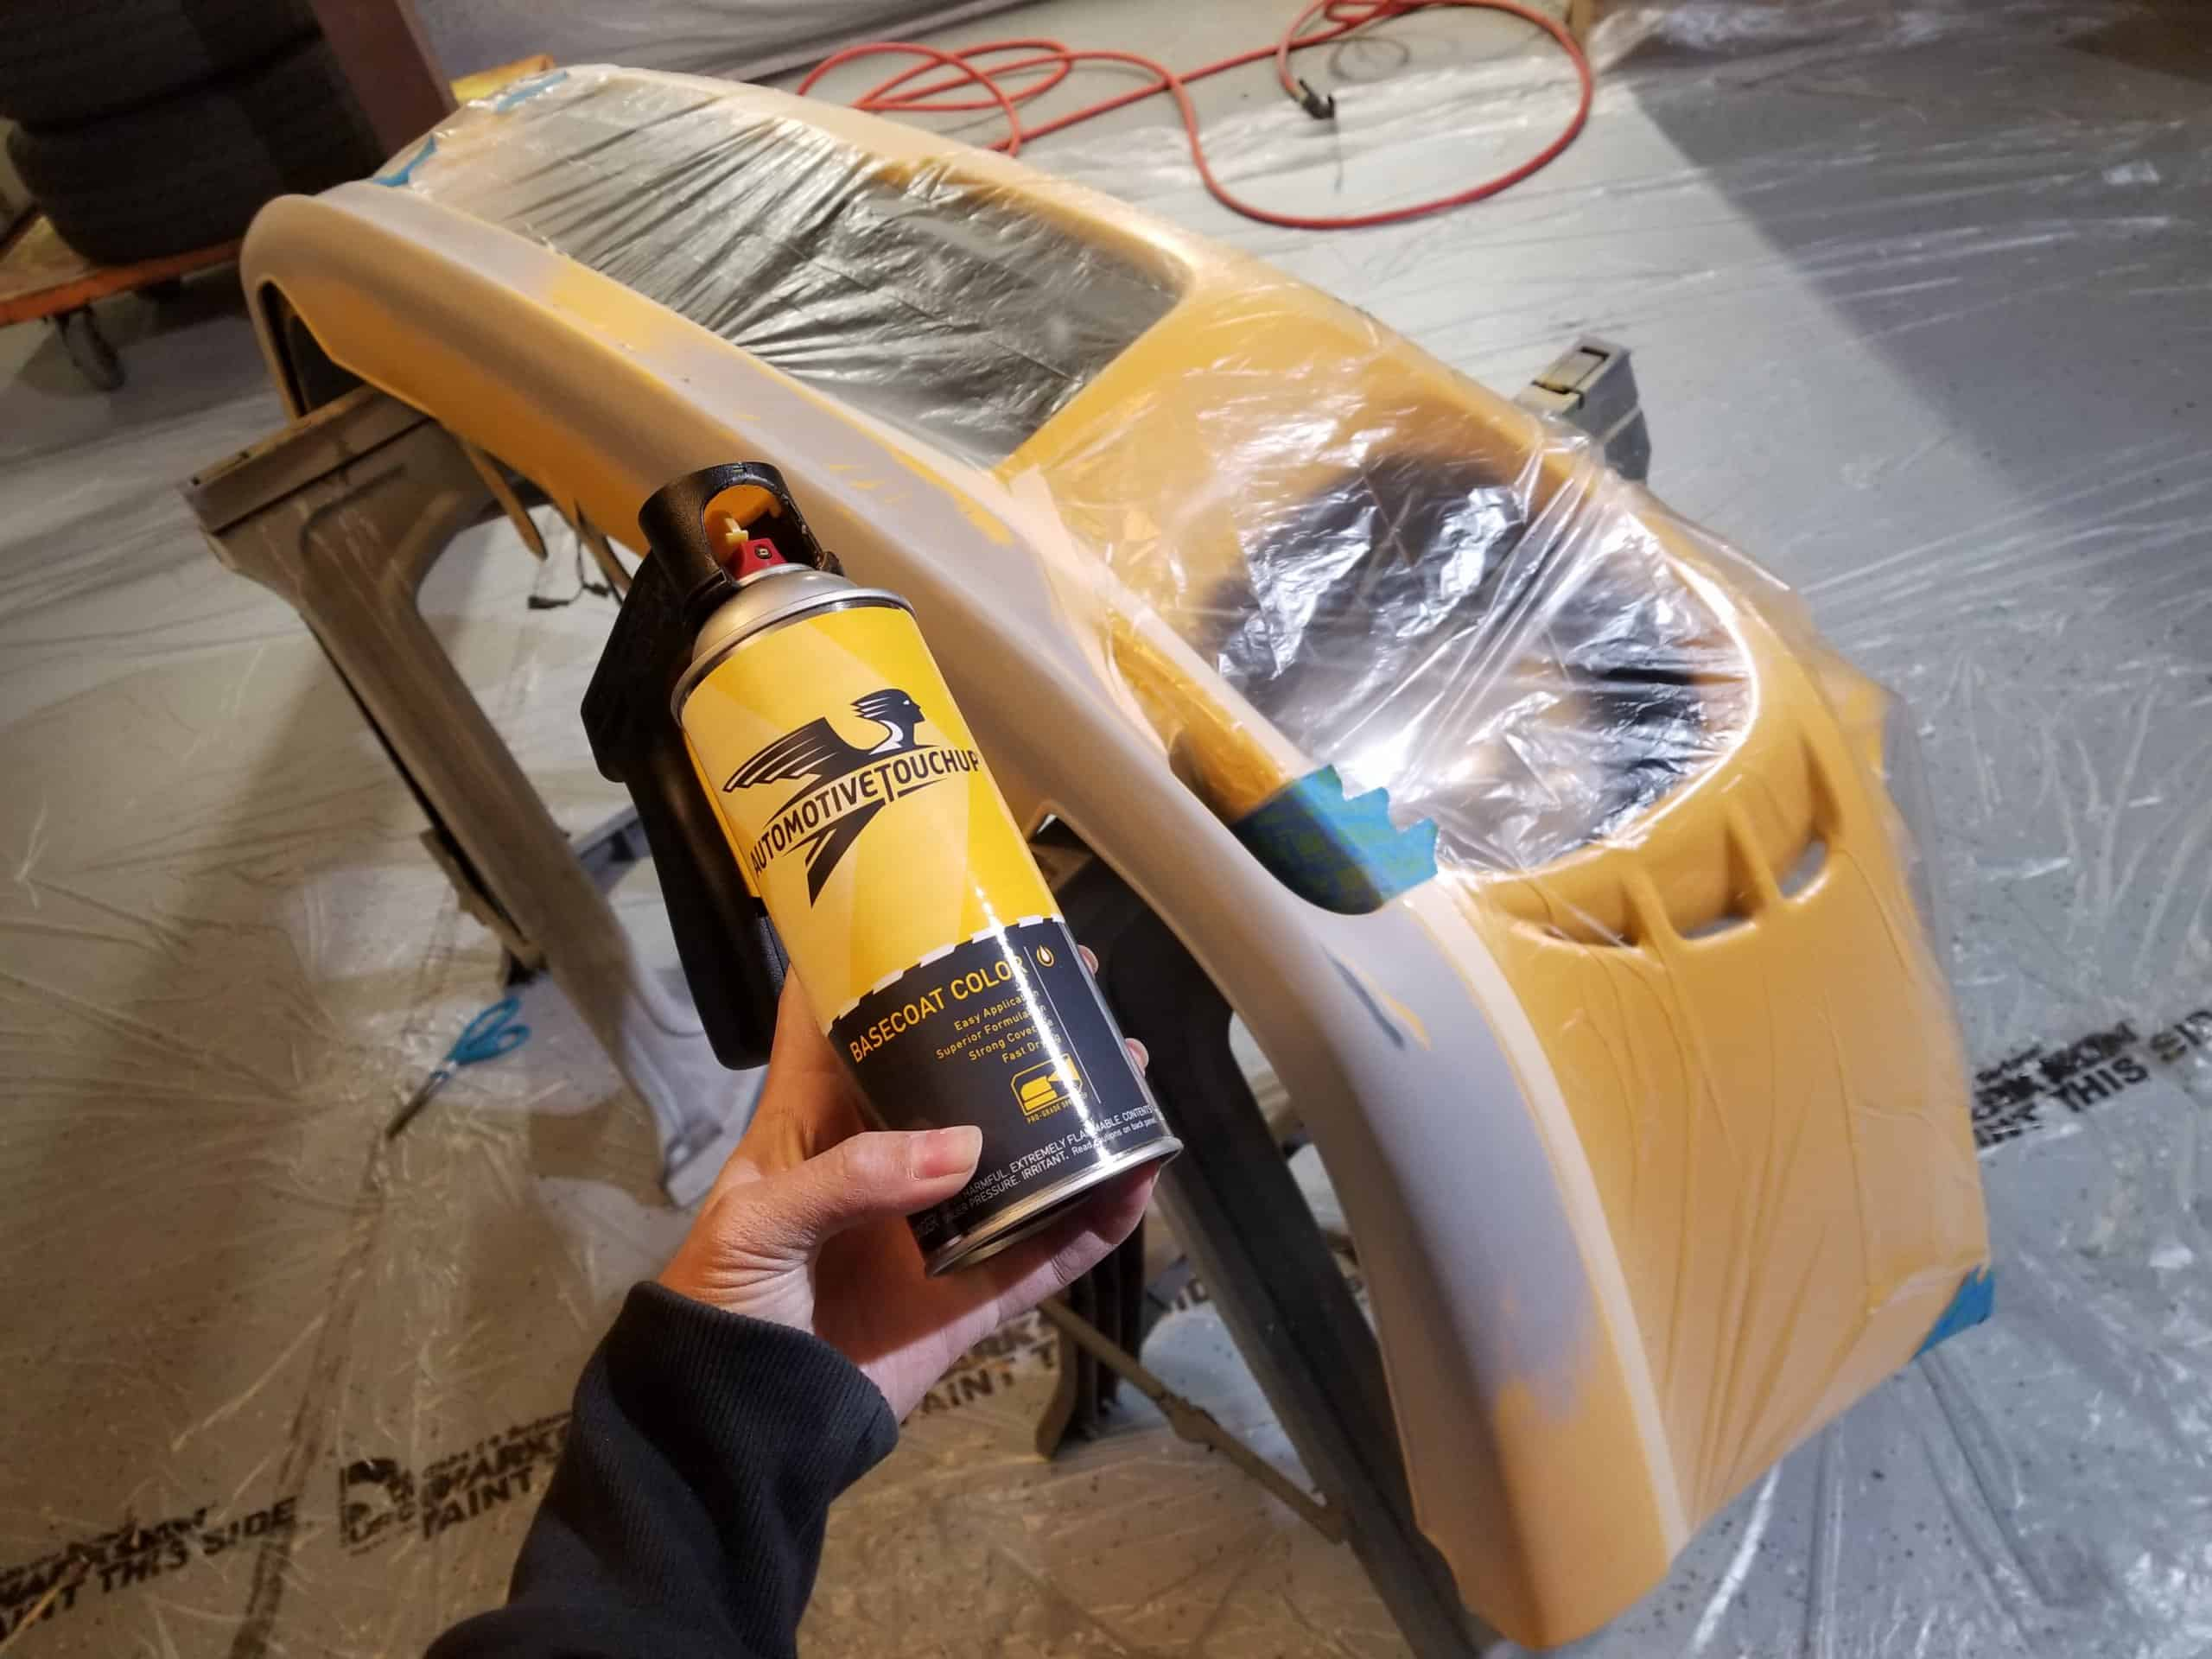 Automotive Touchup basecoat